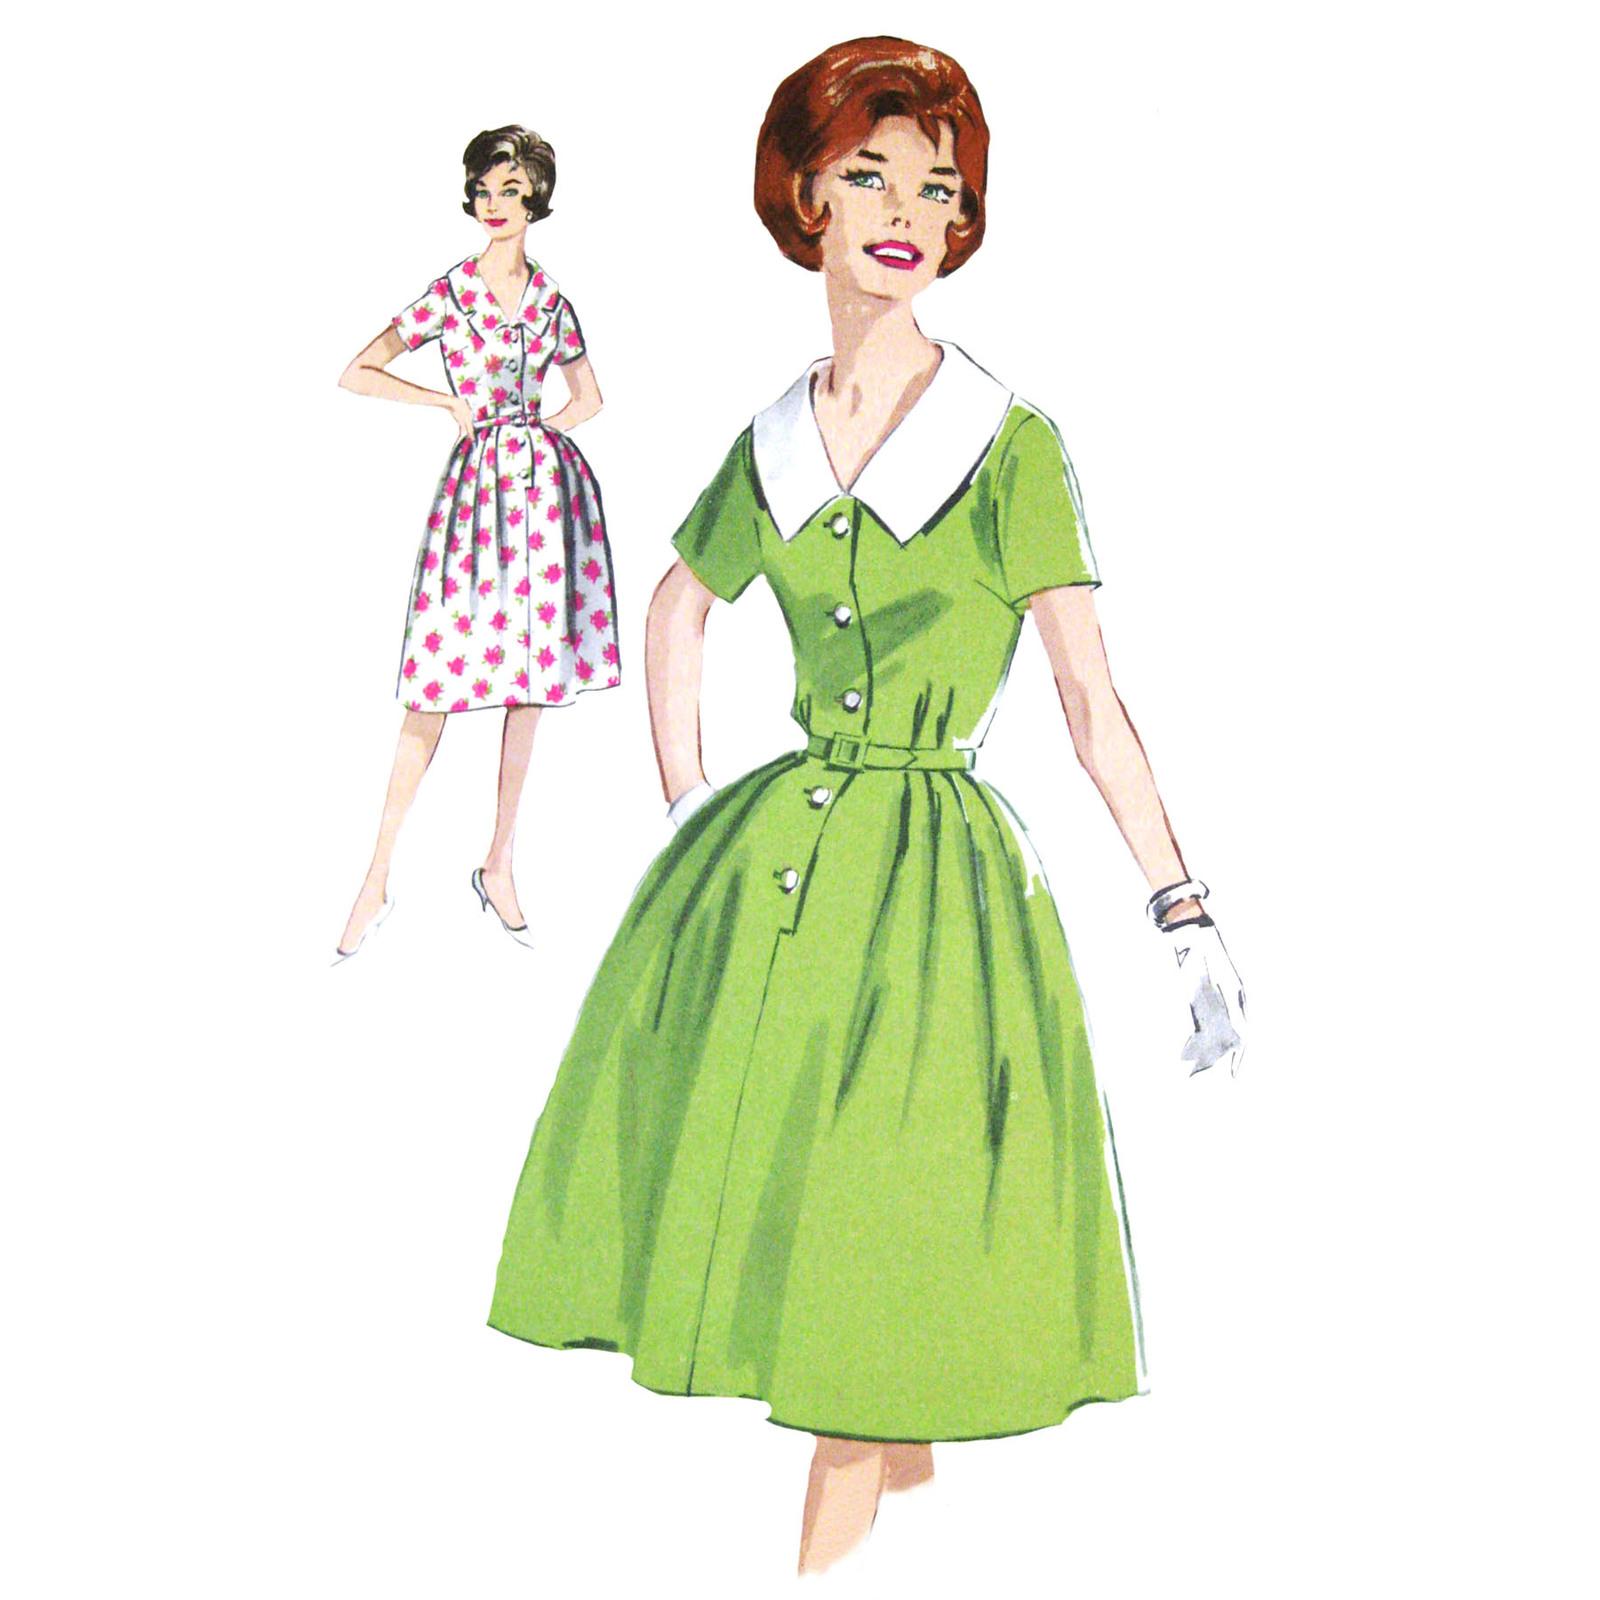 Vintage 60s Advance 2950 Misses Shirtwaist Dress Short Sleeve V-Neck 16/36